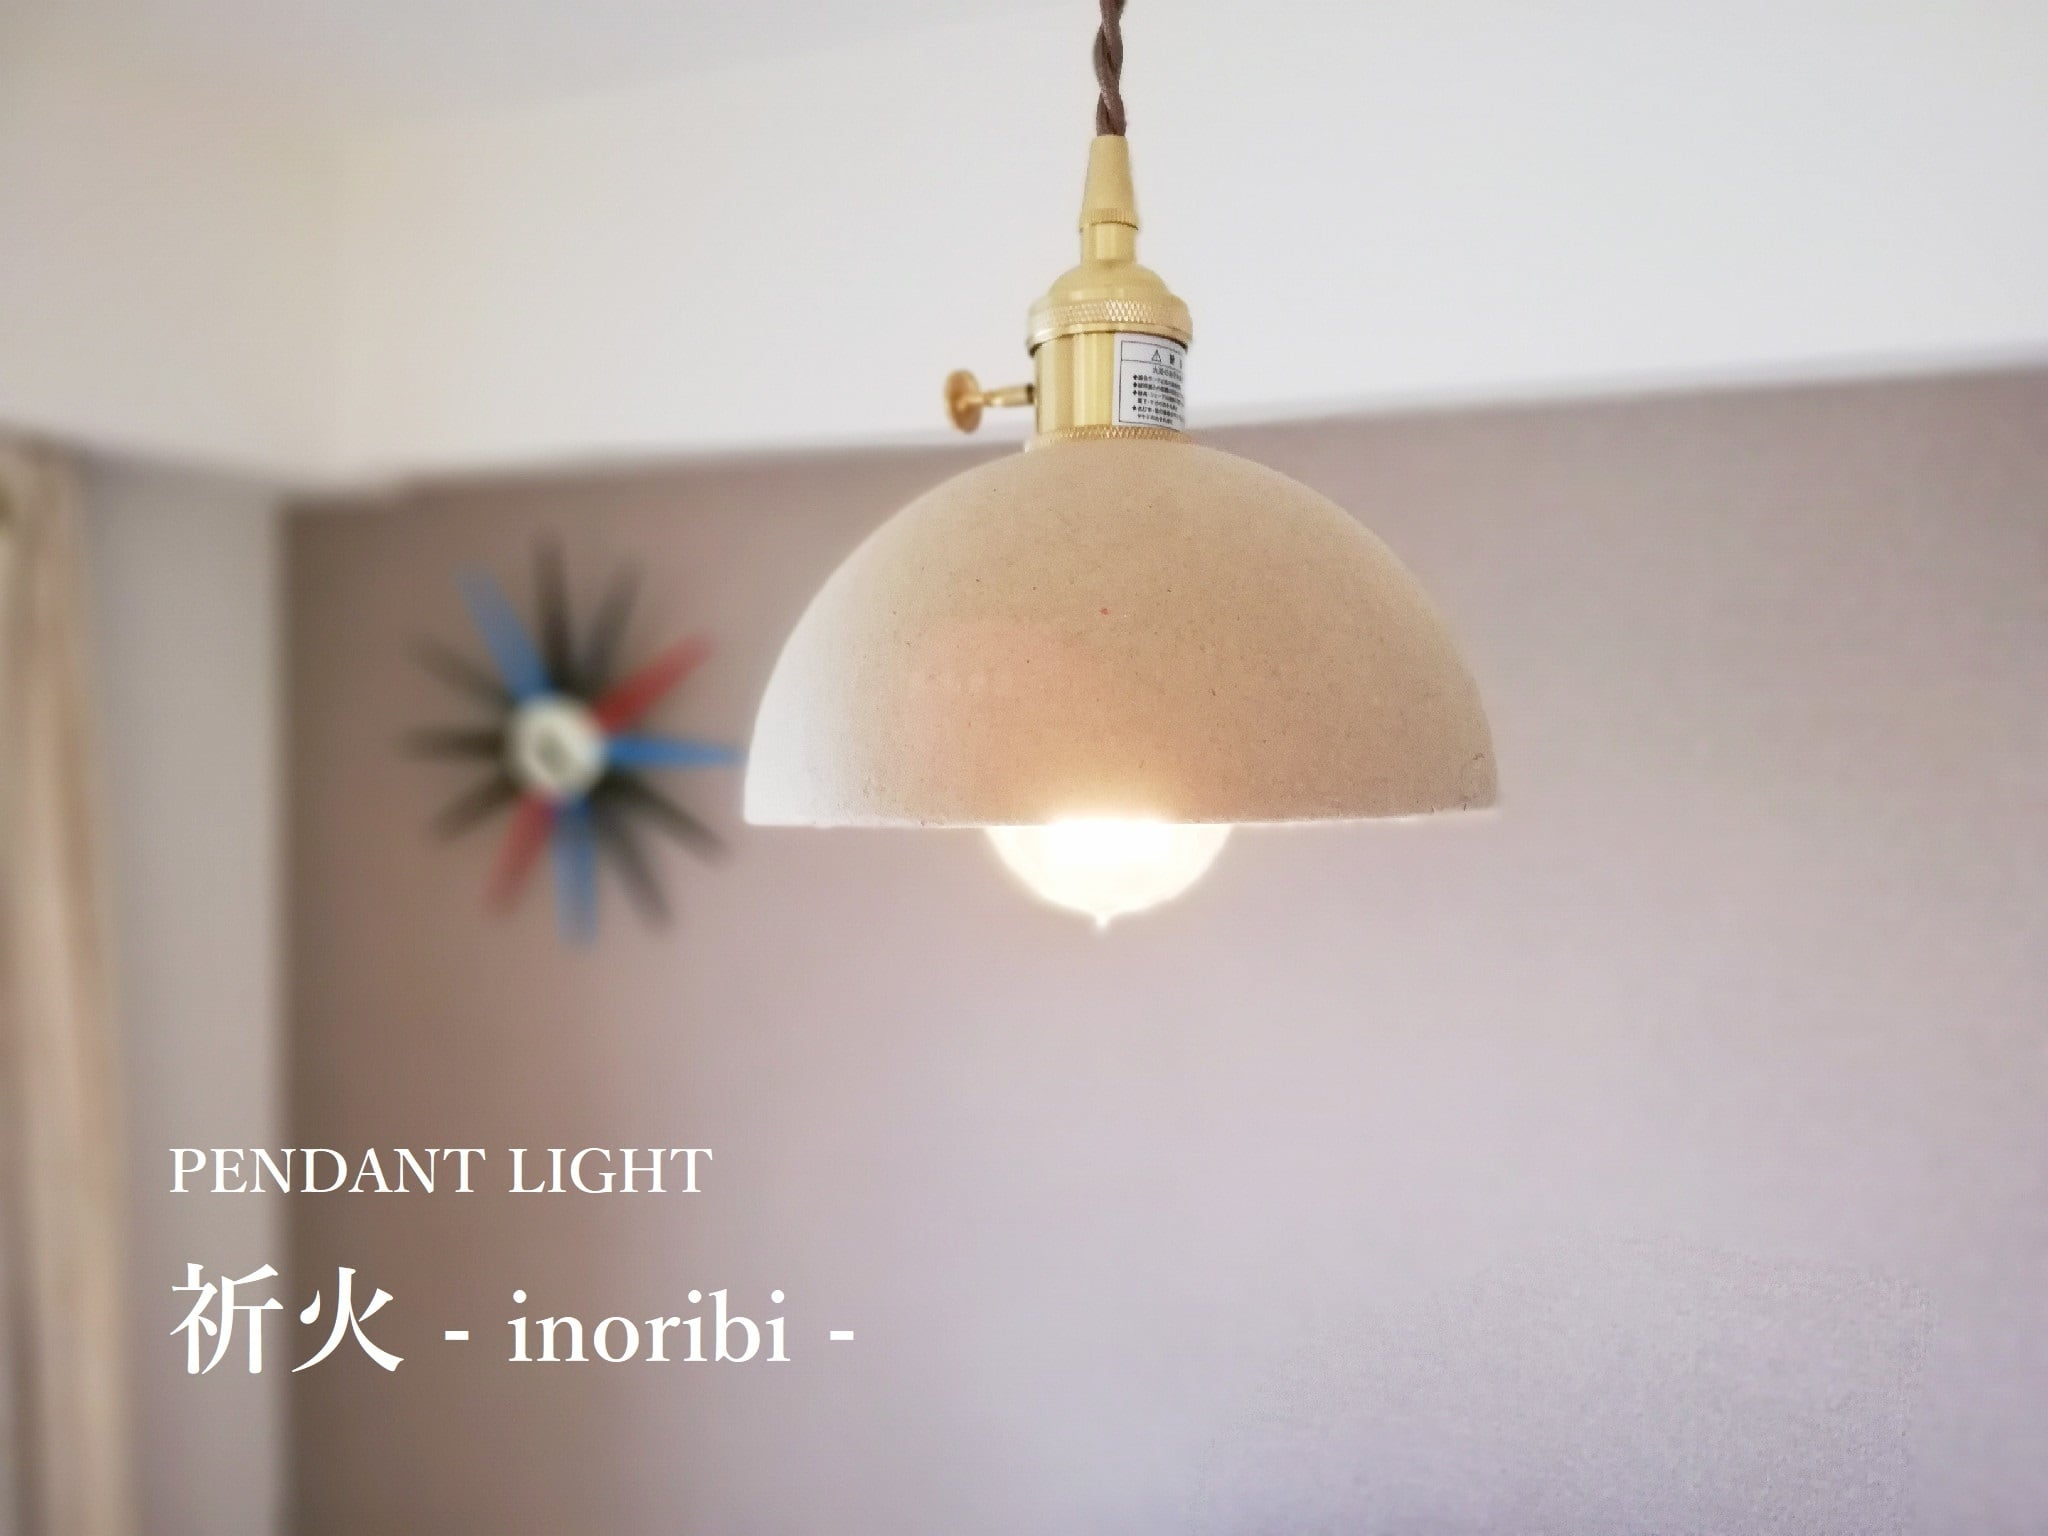 祈火 - inoribi - size:S